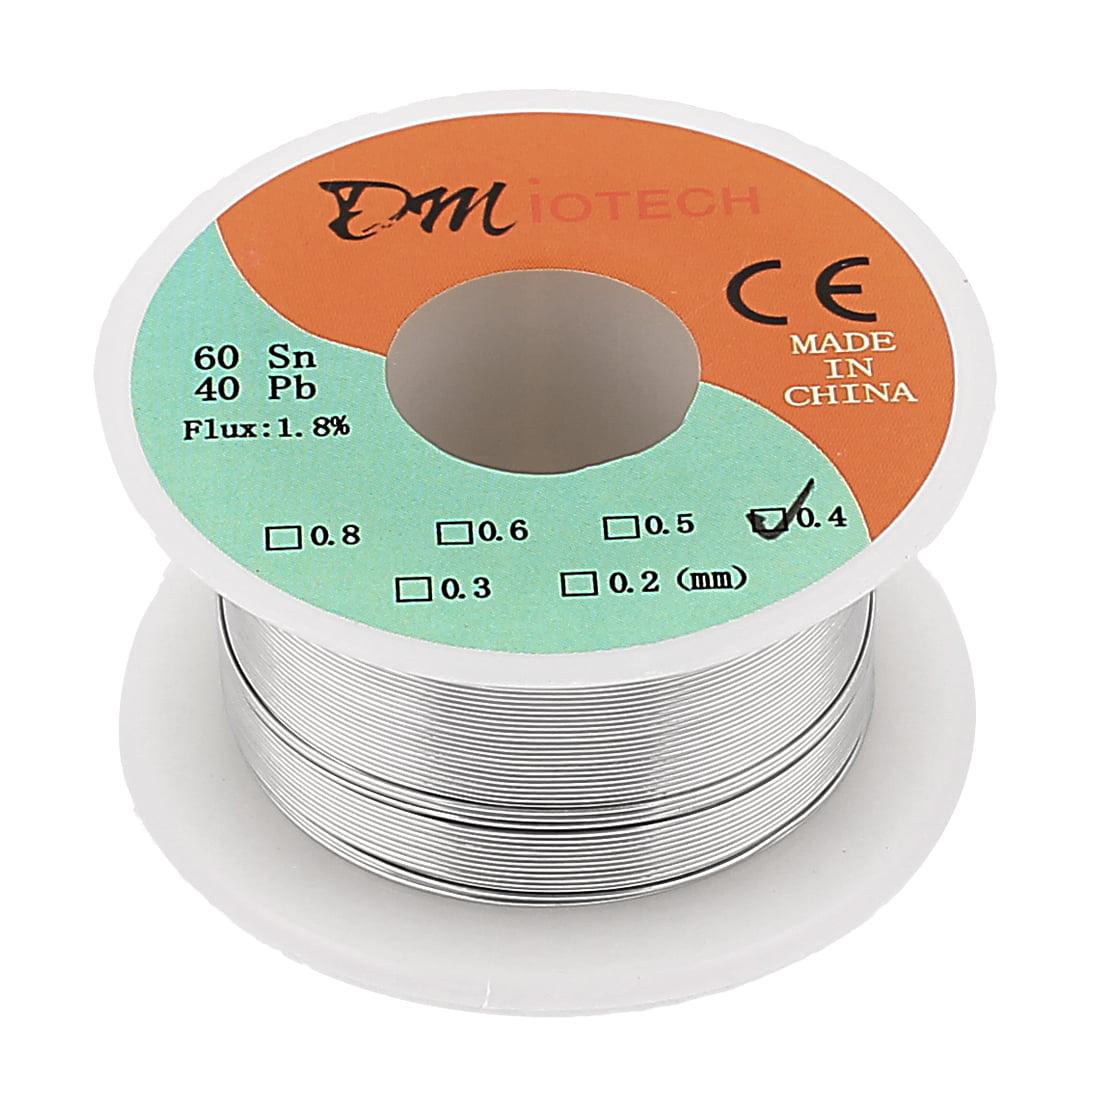 DMiotech 0.4mm 35G 60/40 Rosin Core Tin  Roll Soldering Solder Wire Spool